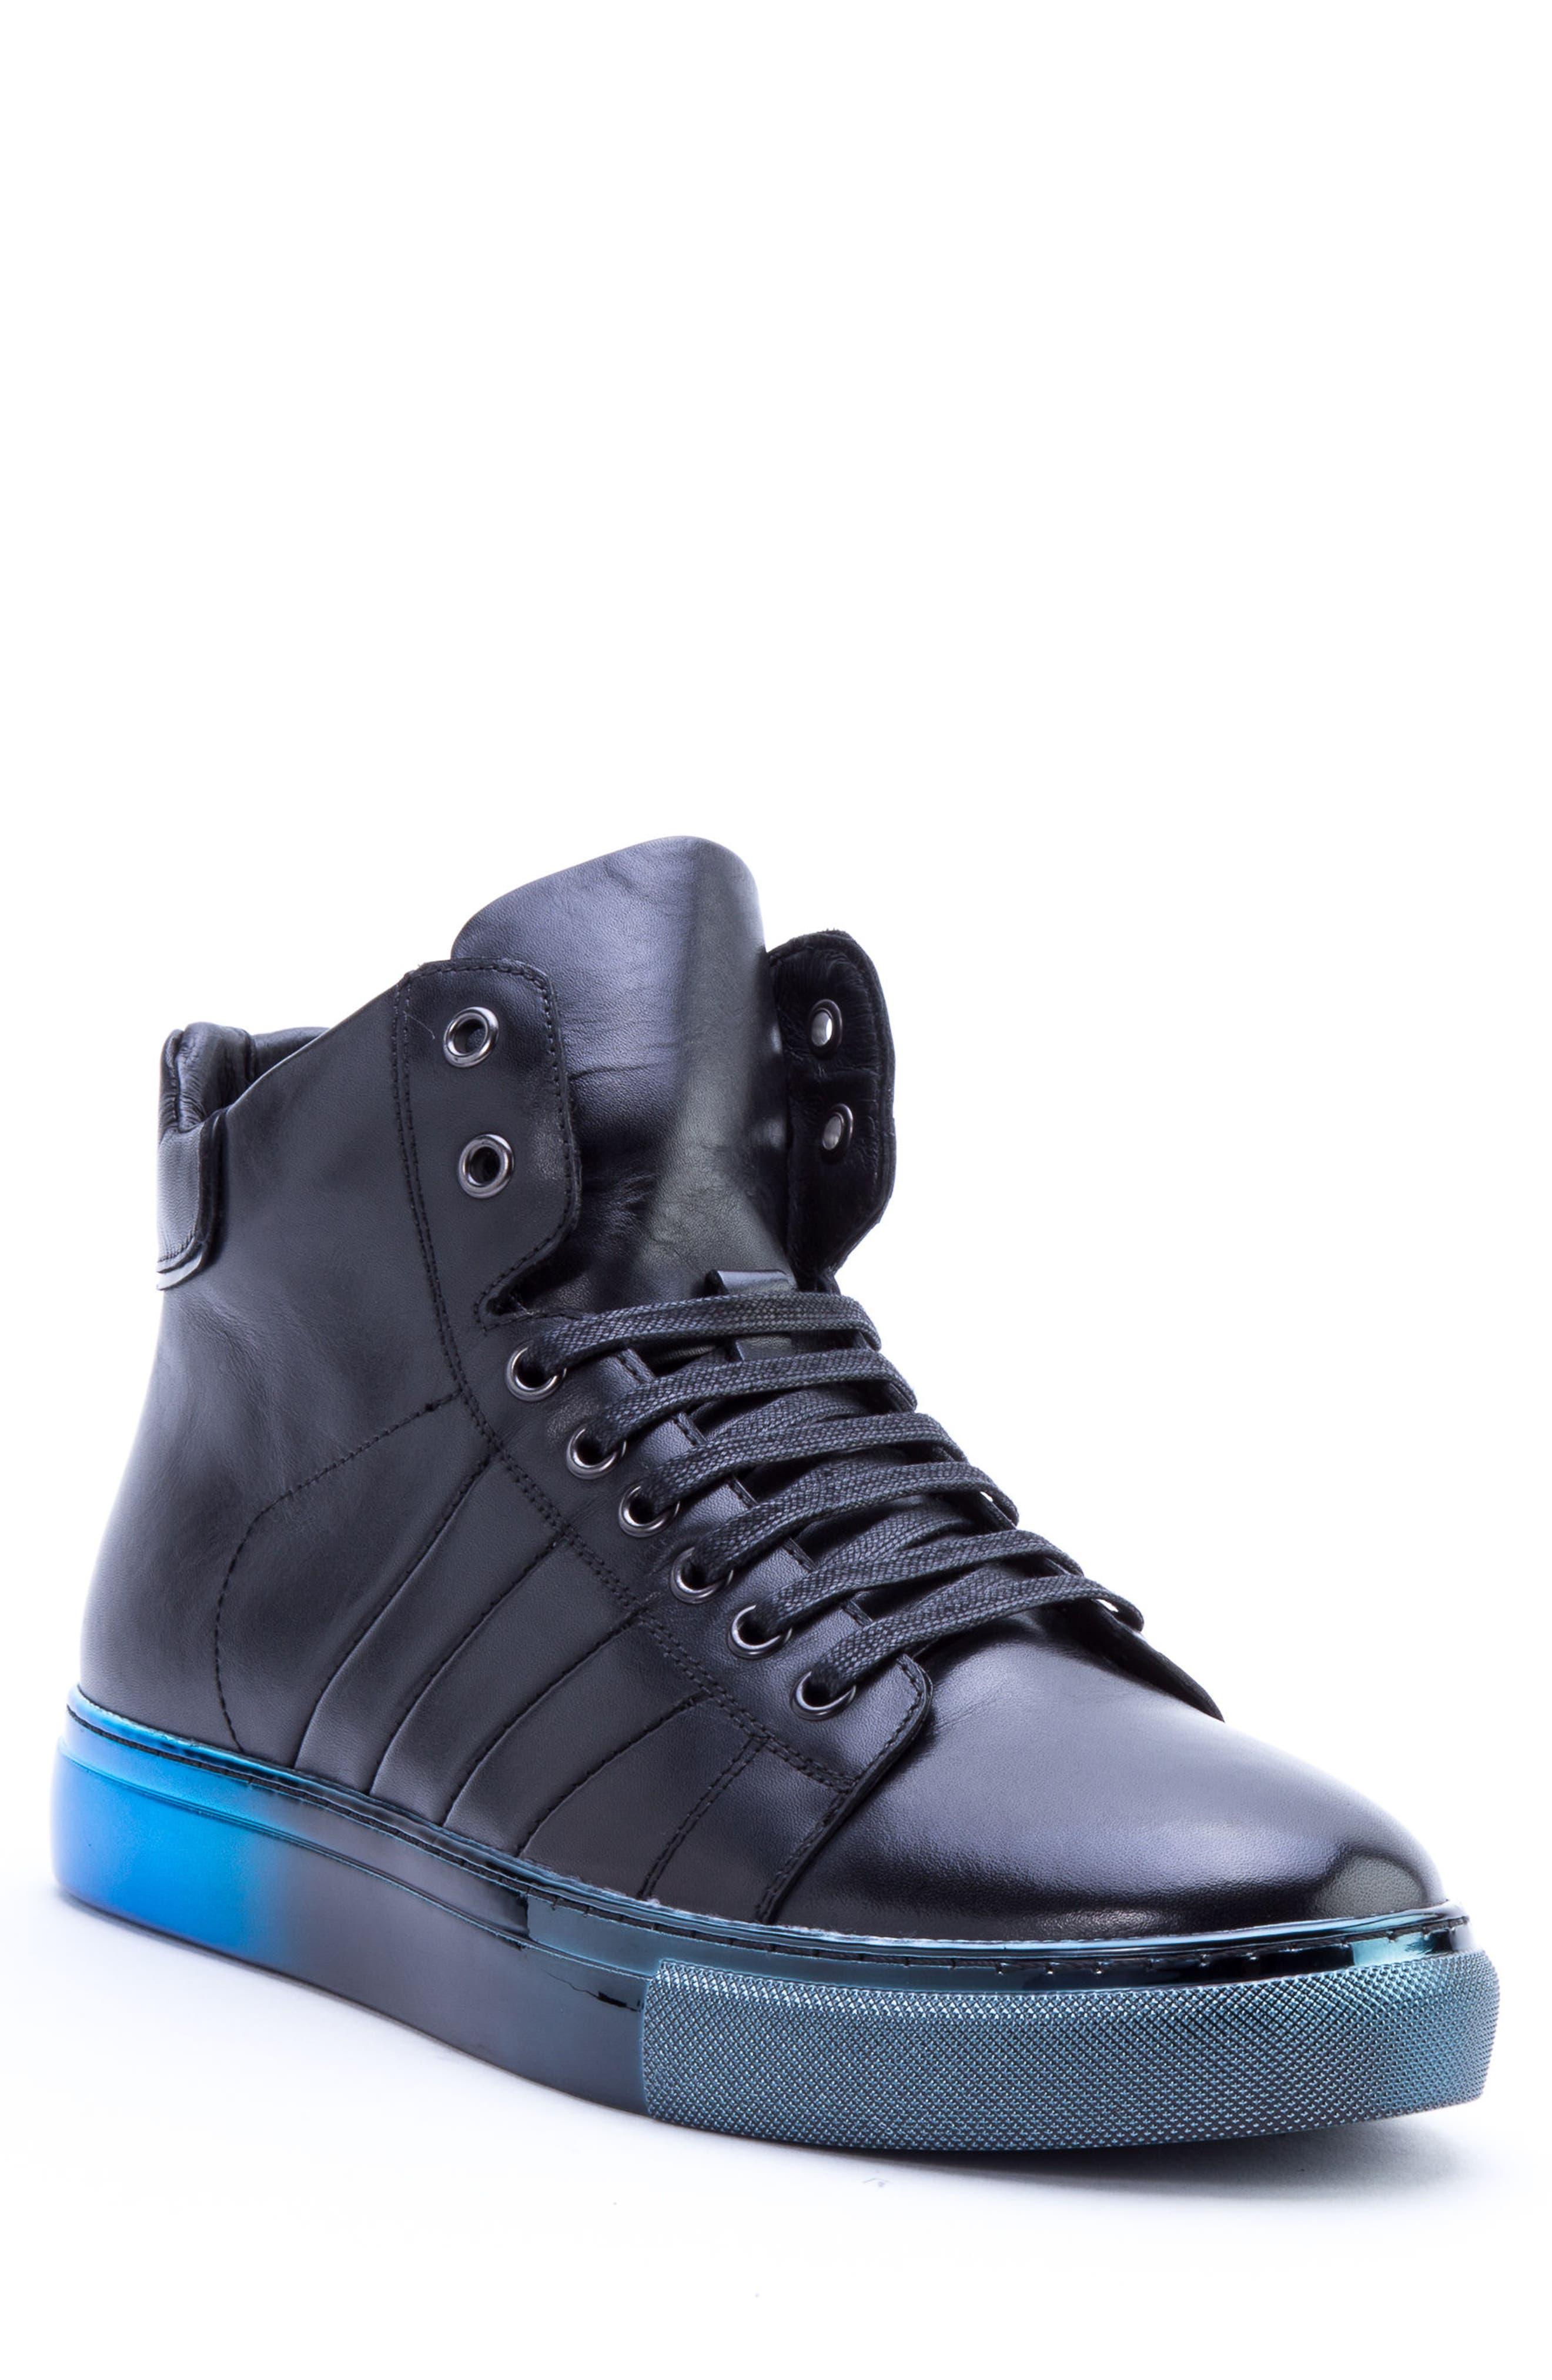 Badgley Mischka Hunter High Top Sneaker,                             Main thumbnail 1, color,                             NAVY LEATHER